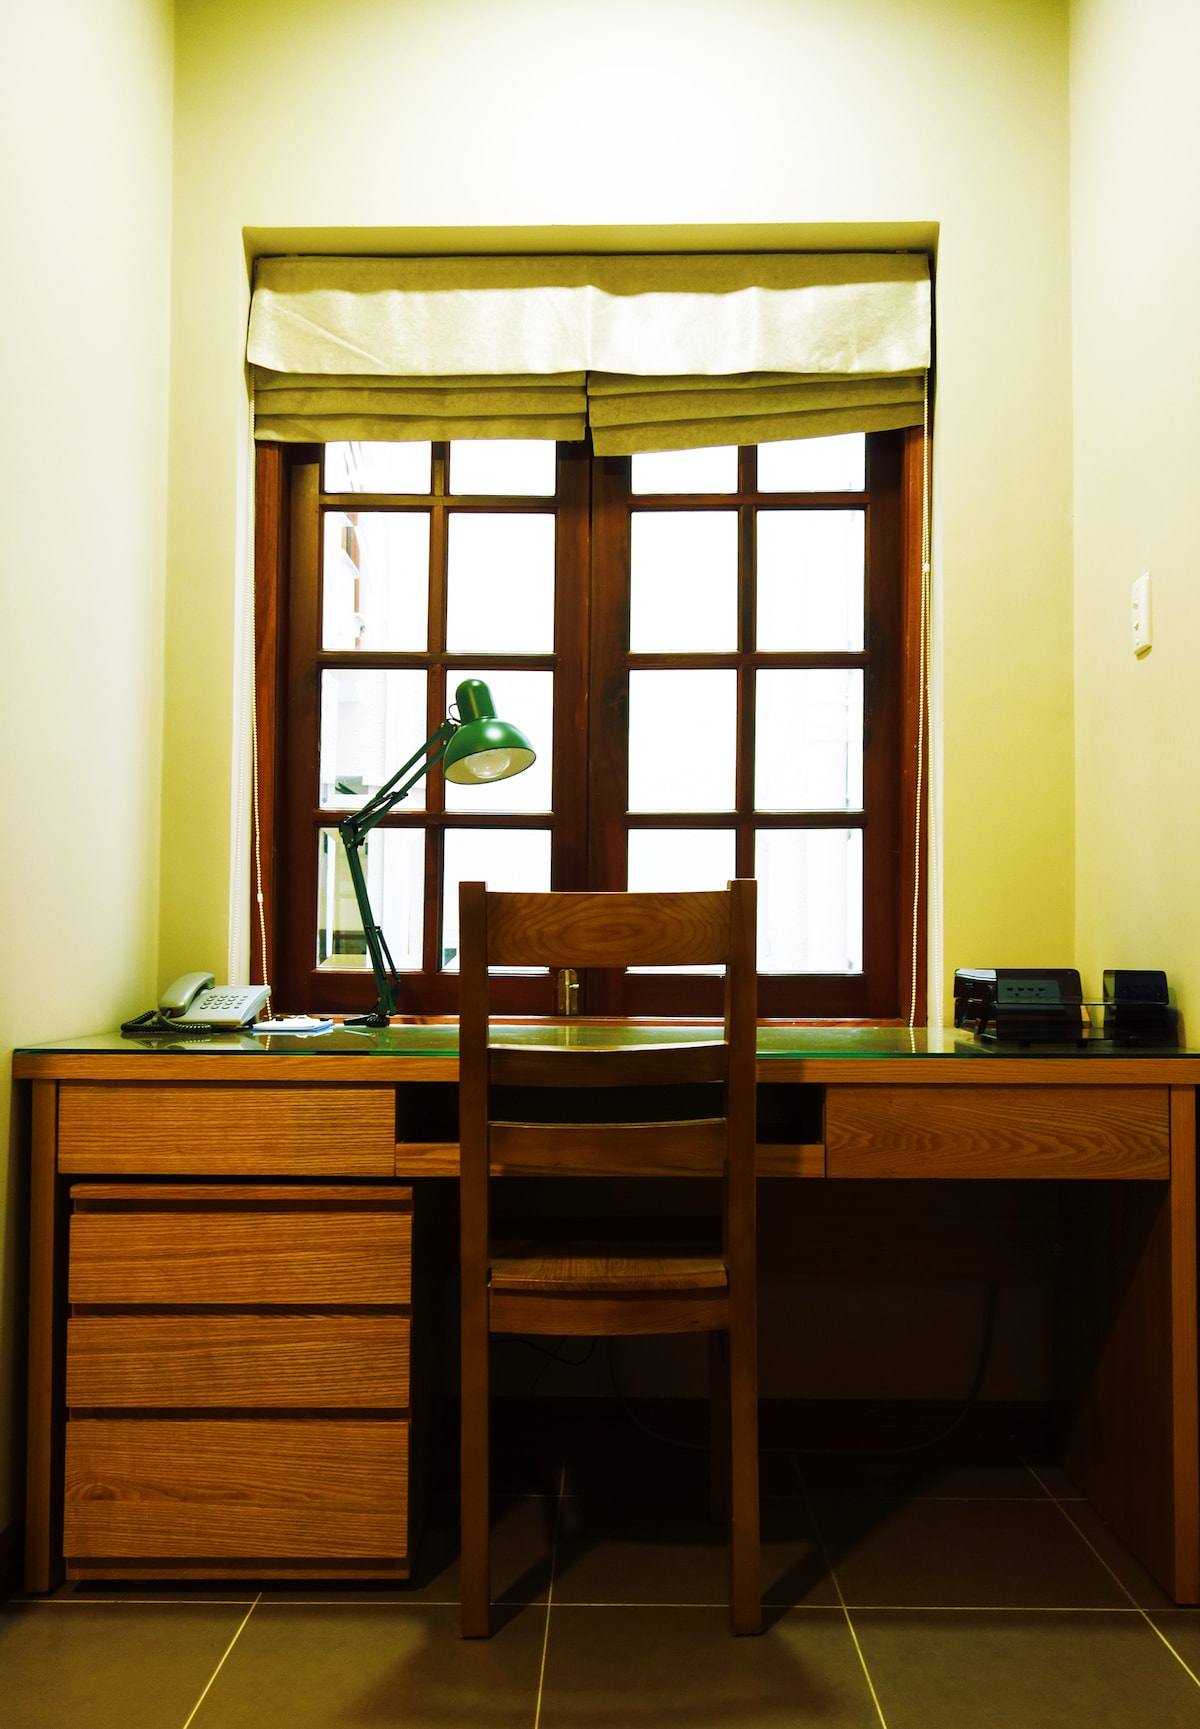 AN's Studio - A2: Home Sweet Home